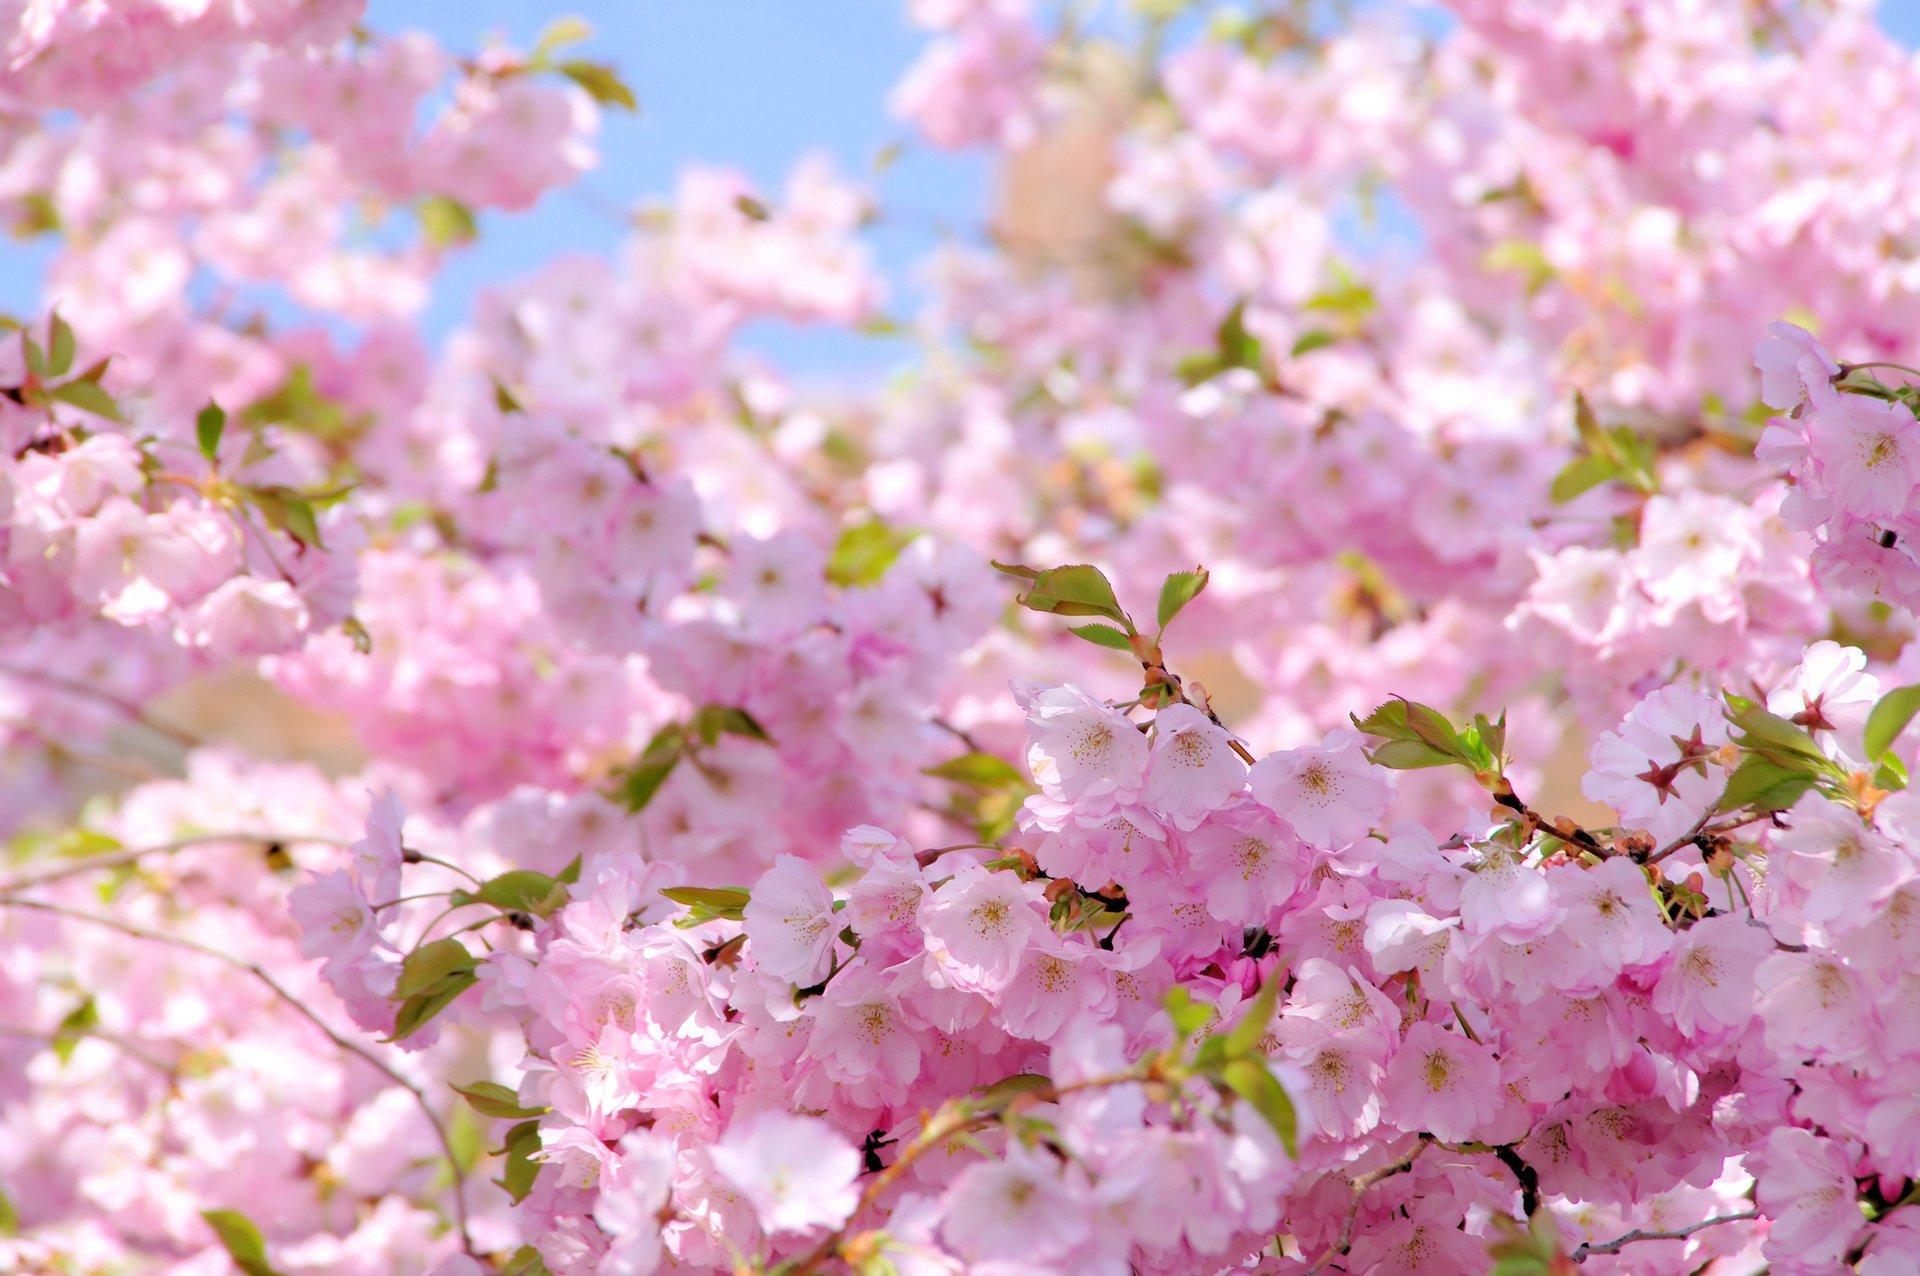 Фото весны на телефон